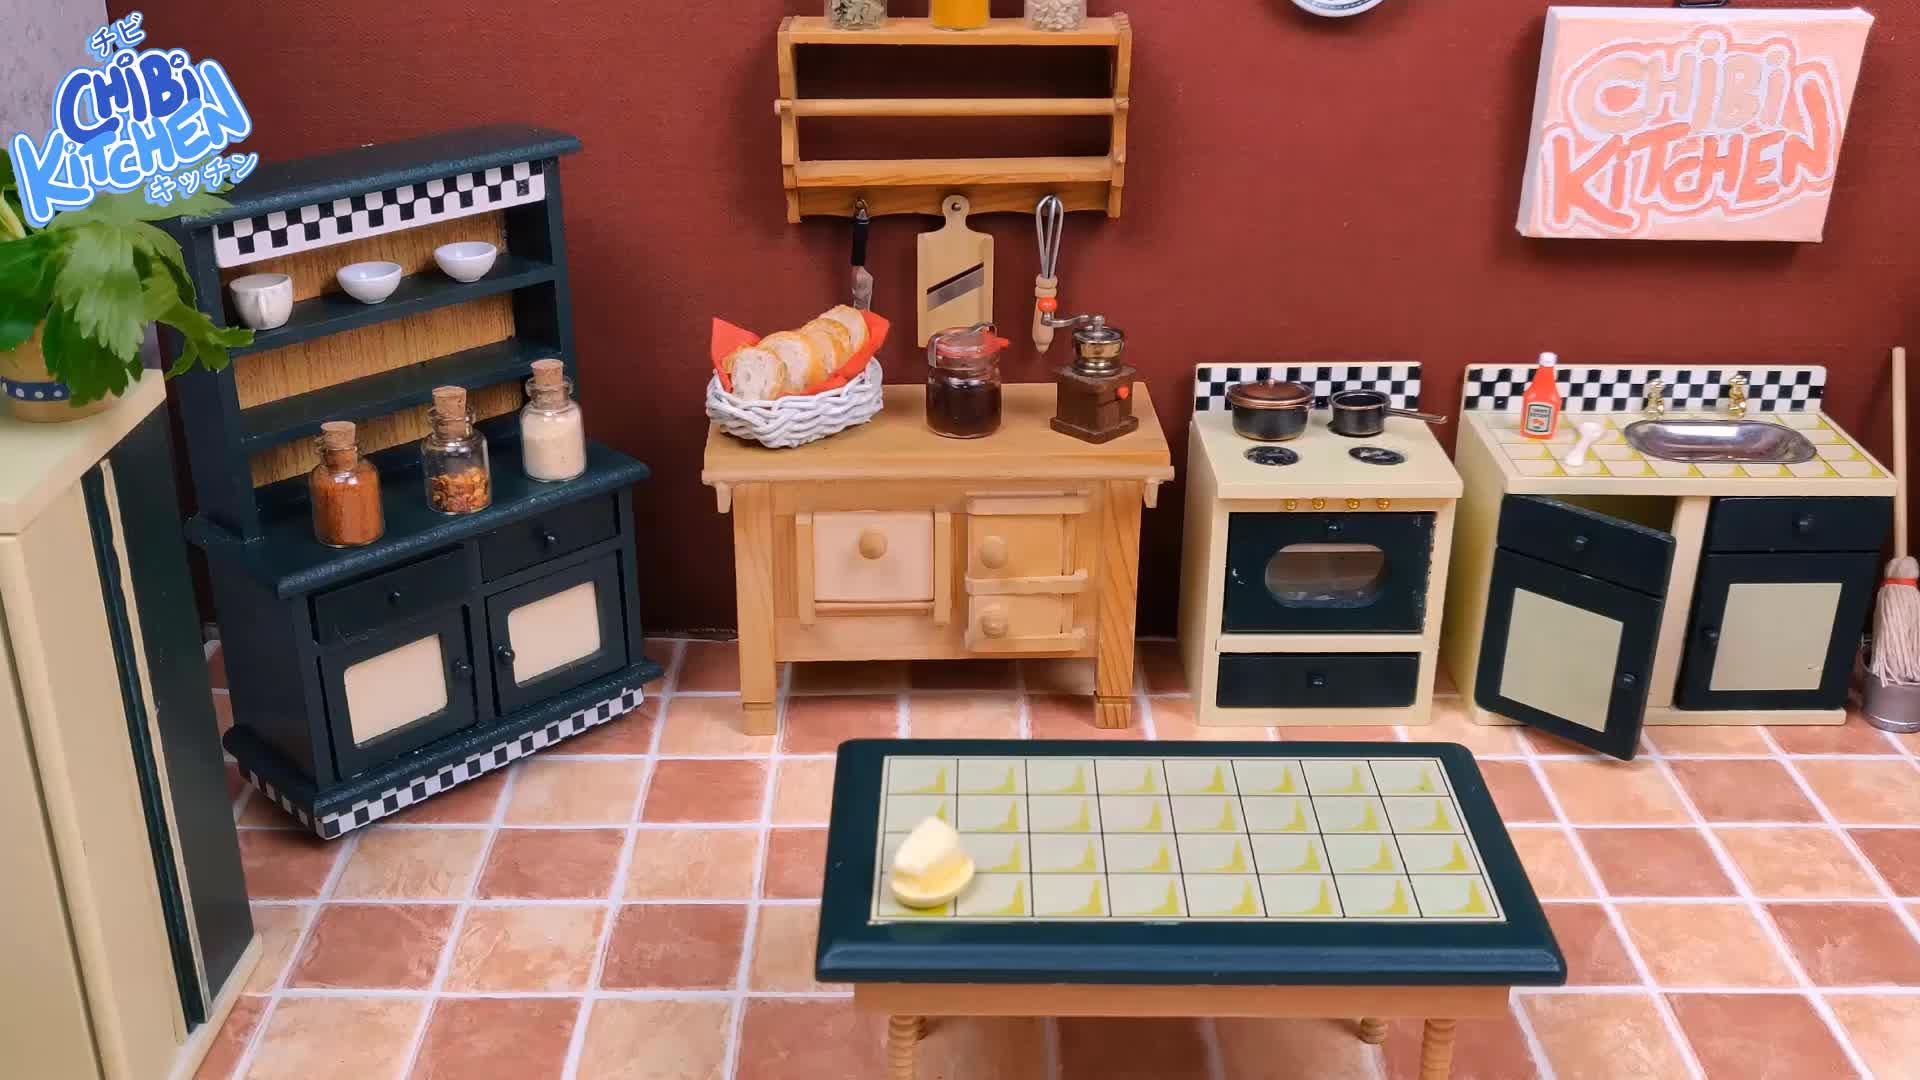 1 minute recipe, cooking, food, food recipes, gif recipe, gifrecipe, mini cooking, mini kitchen, recipe, recipes, Mini cooking: Spaghetti Carbonara GIFs